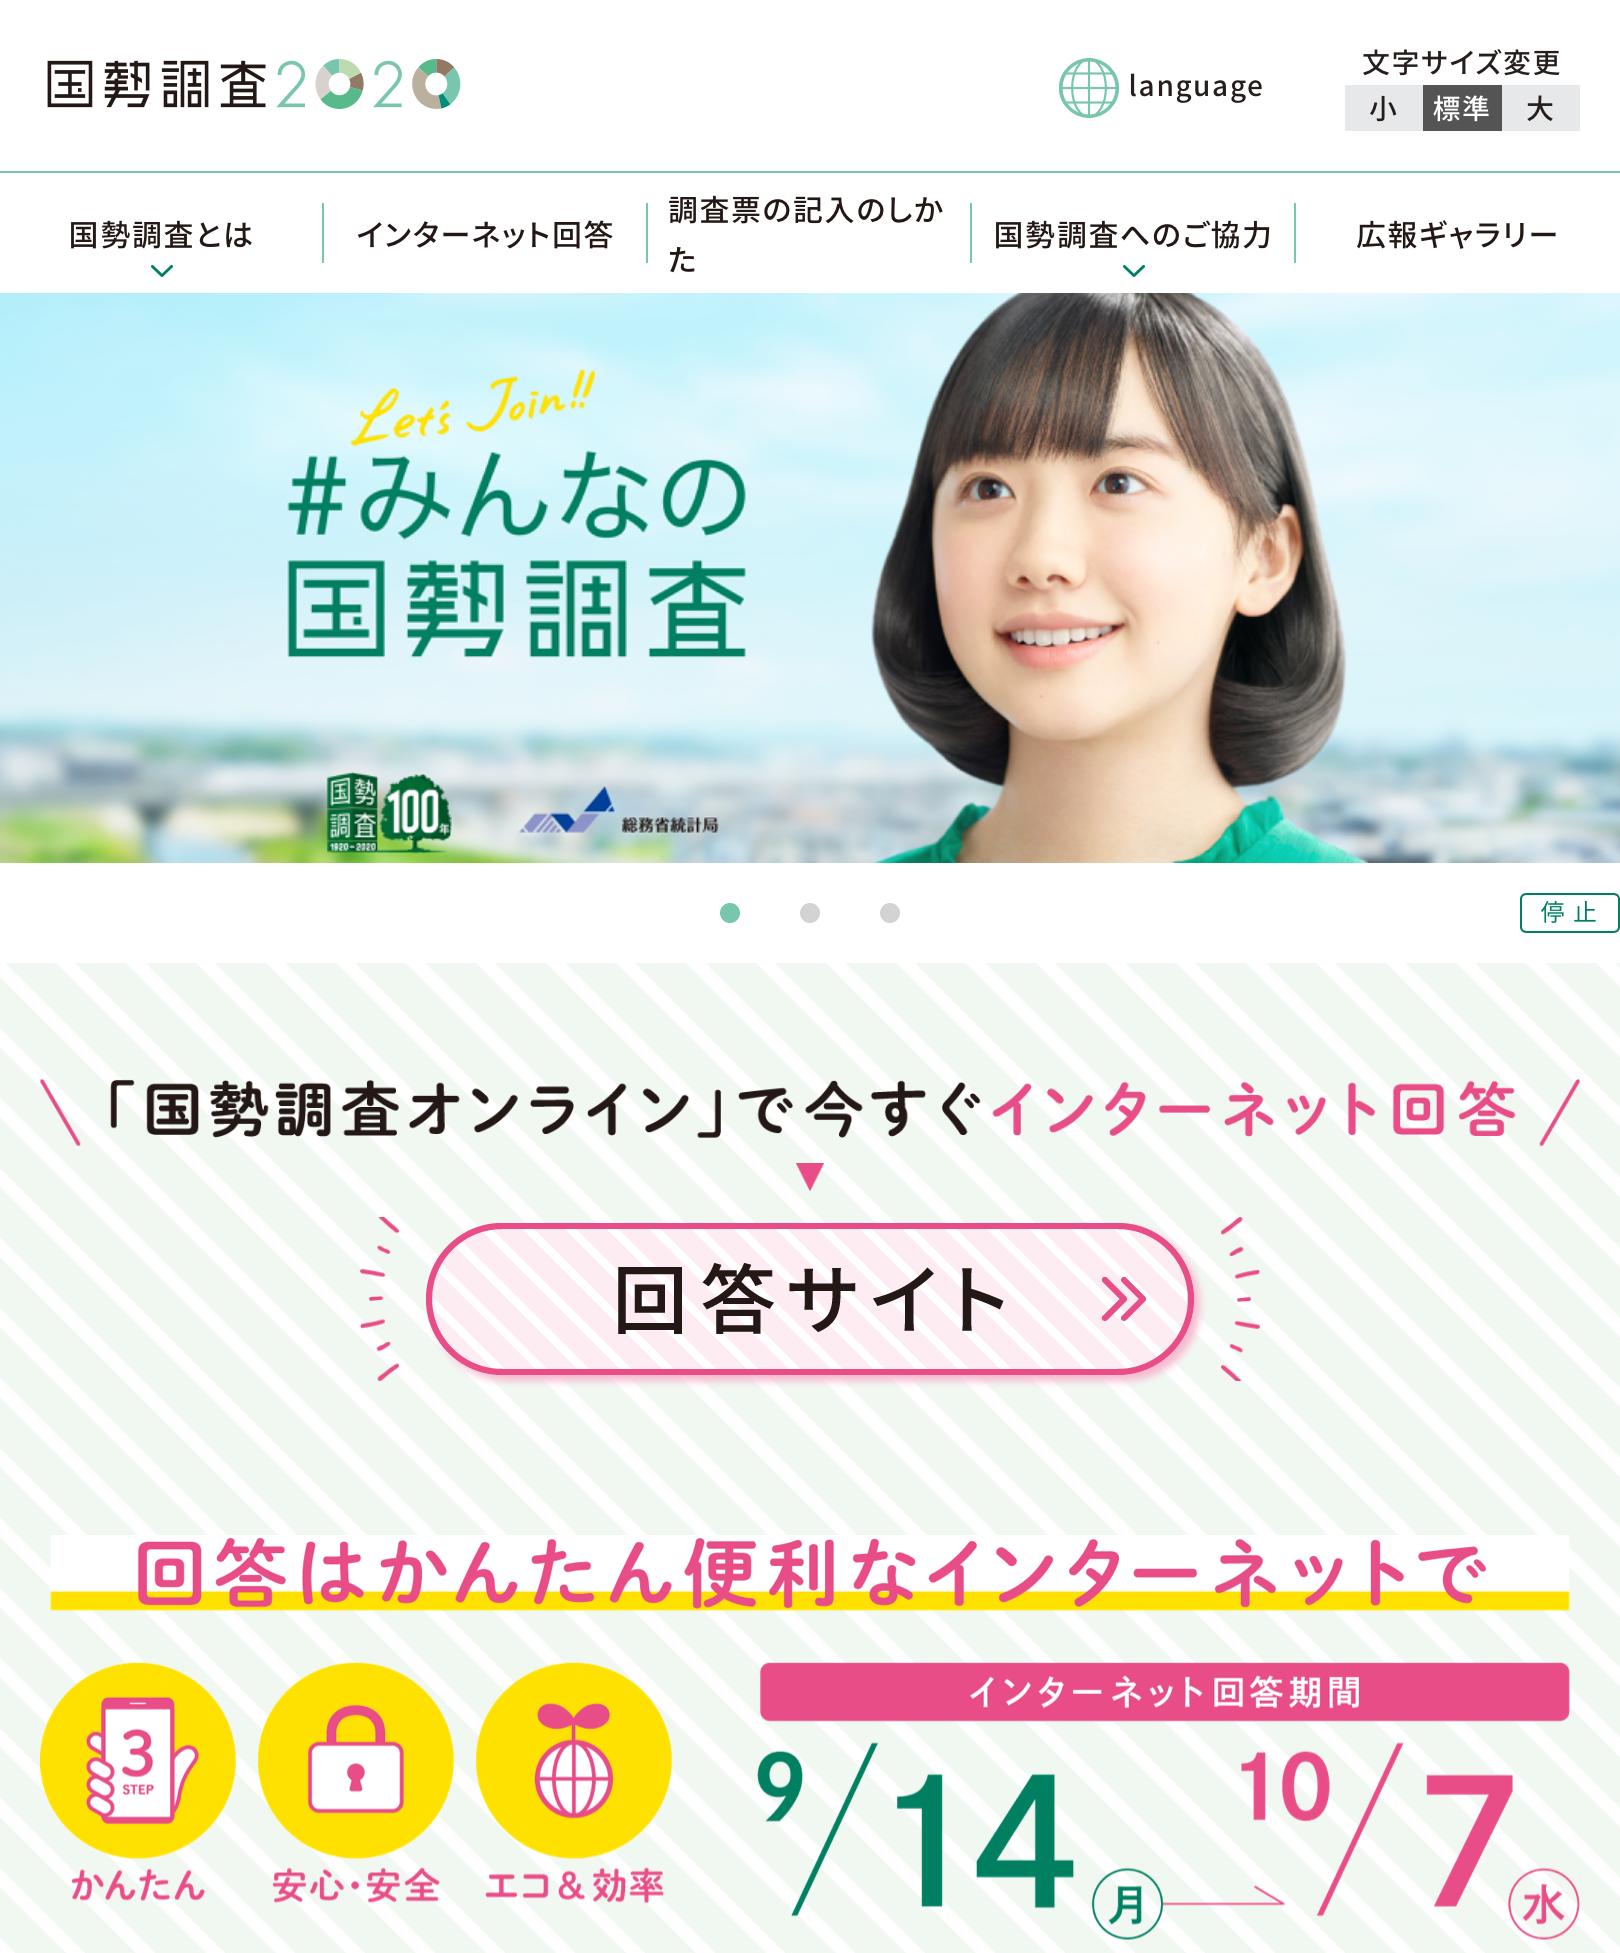 f:id:Imamura:20200930205347p:plain